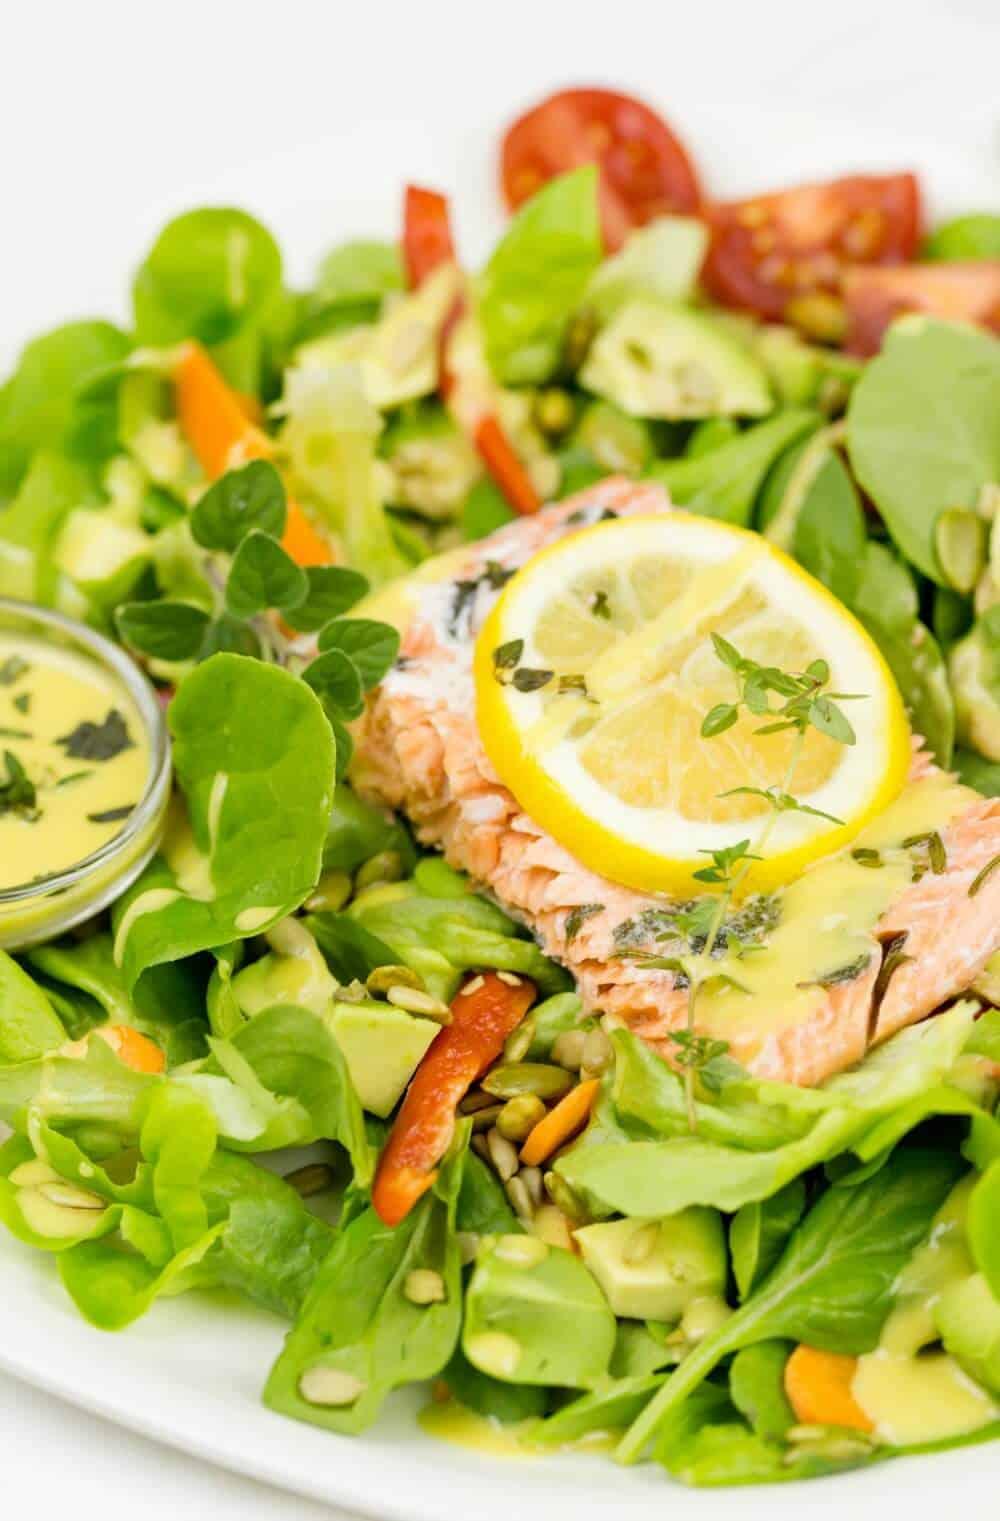 Lemon and Herb Salmon with Honey Mustard Dressing Recipe